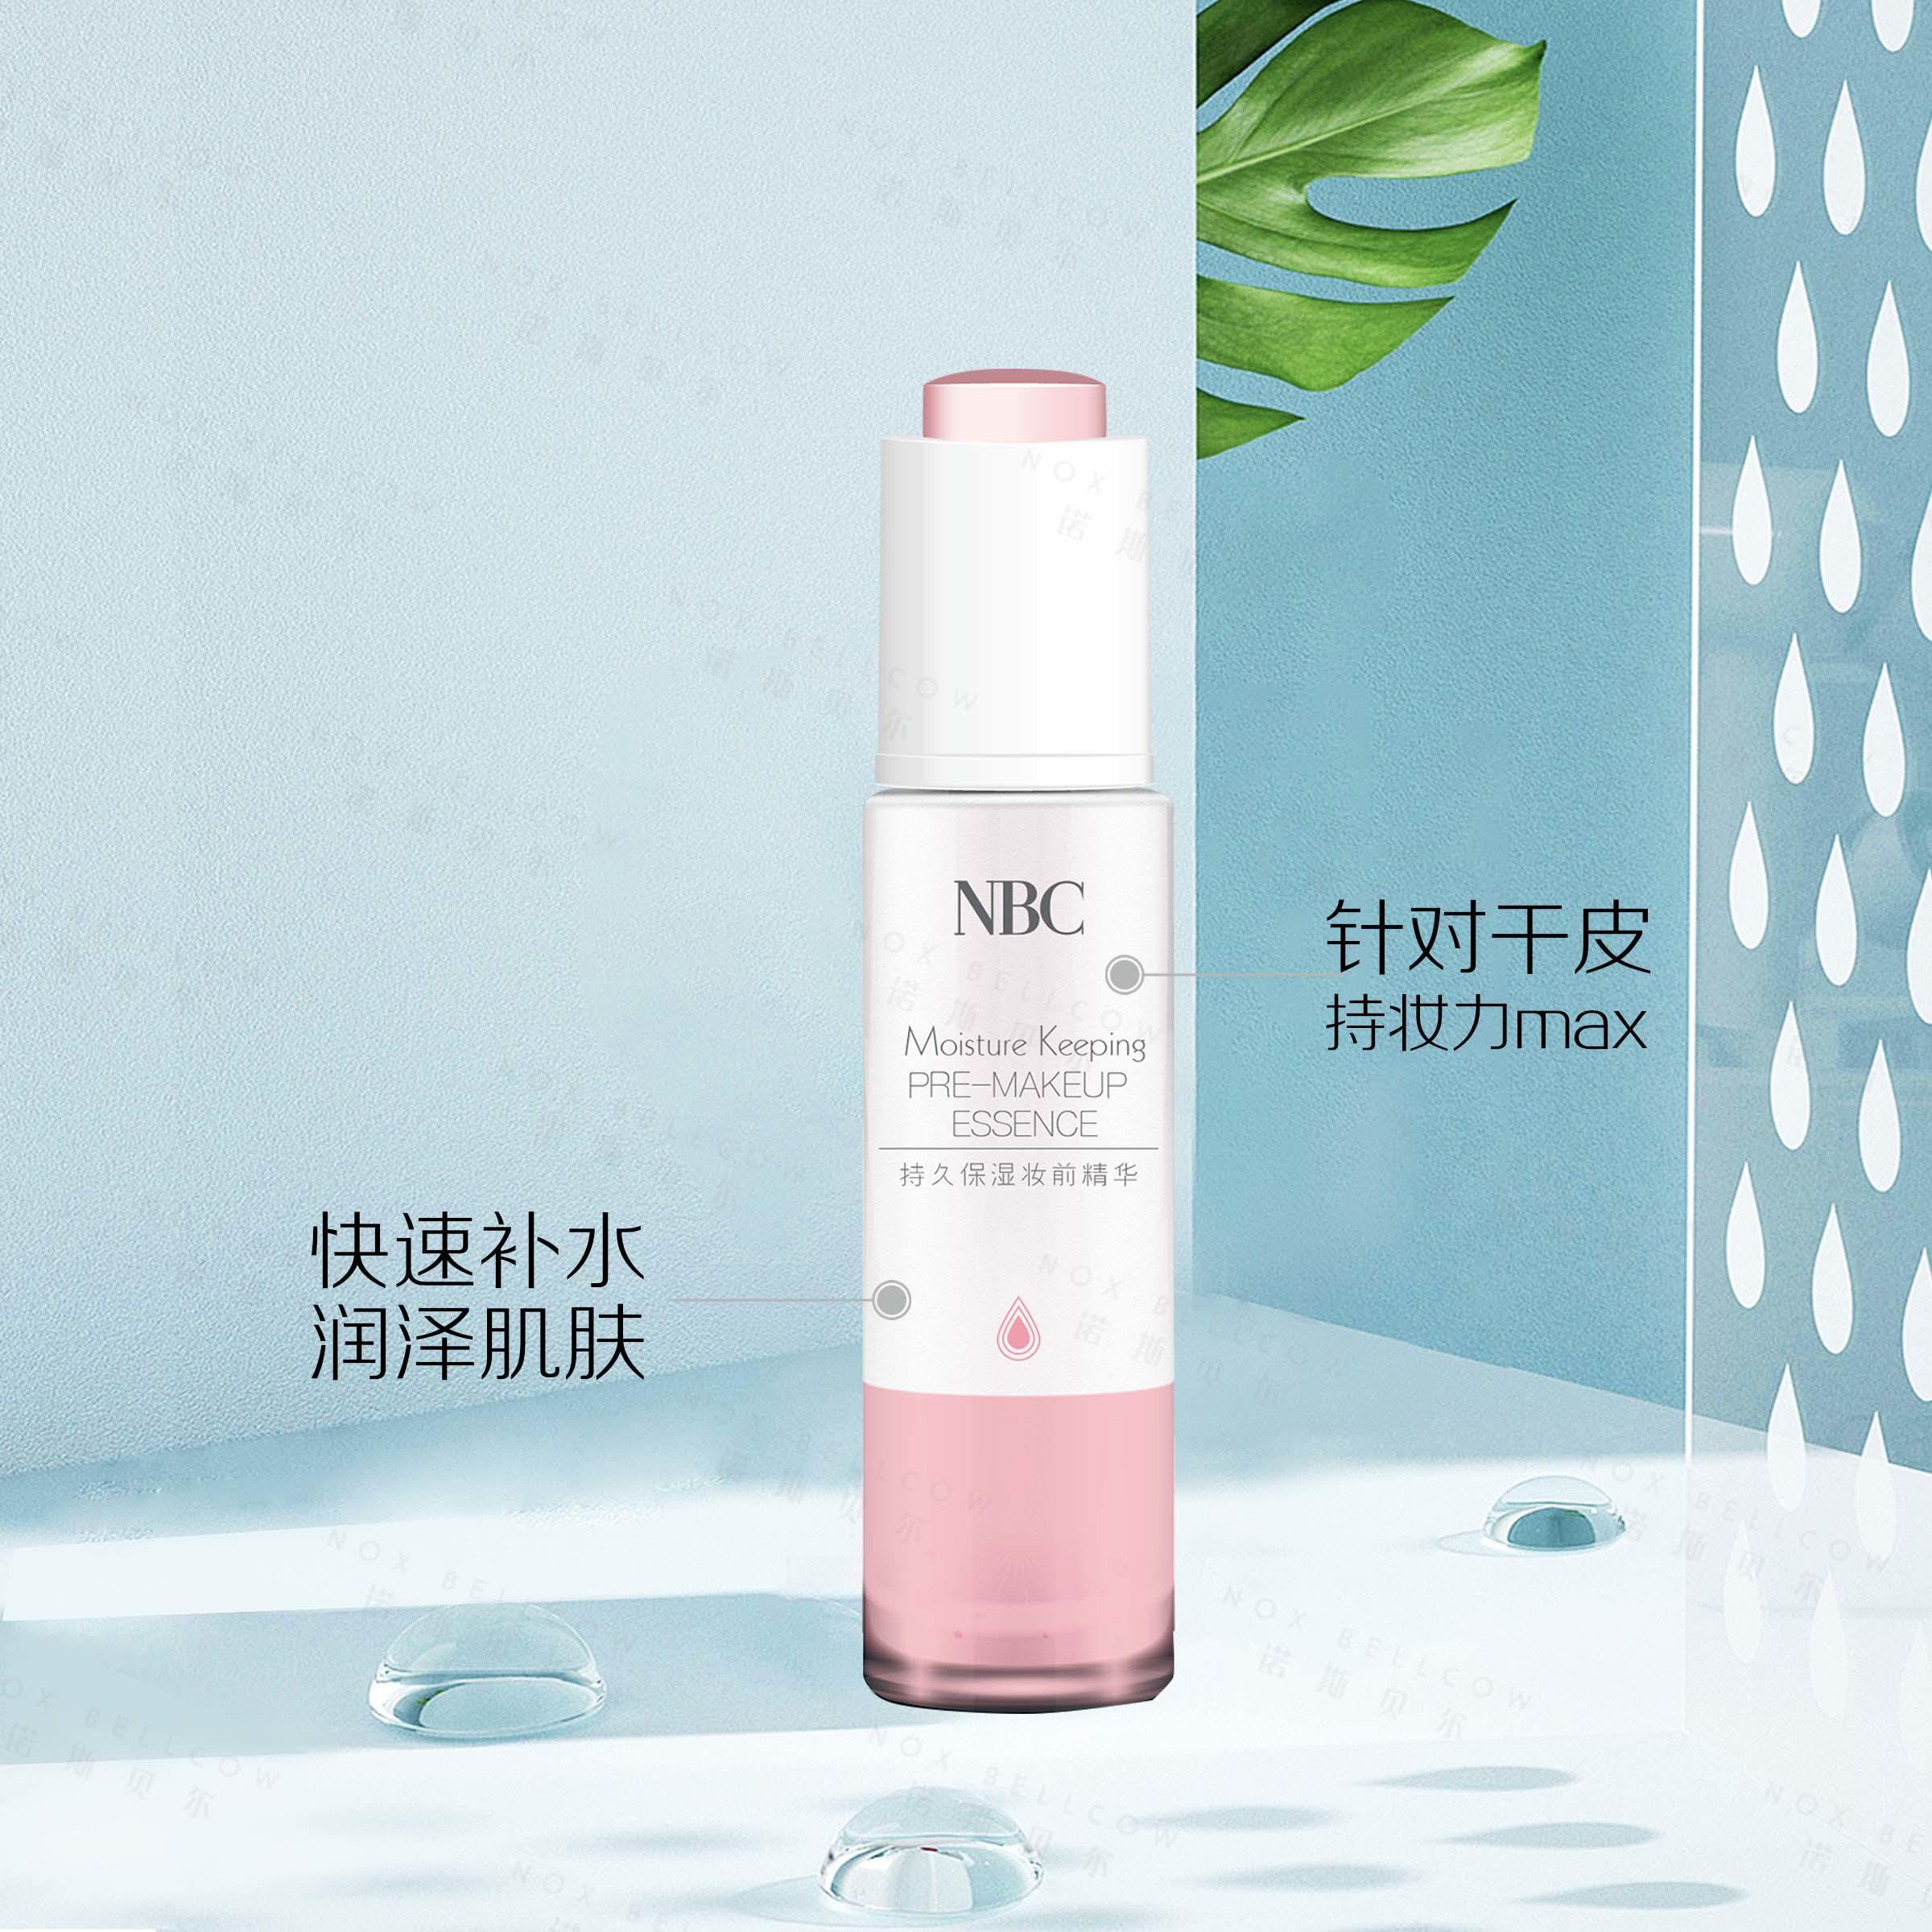 NOX BELLCOW Wholesale Pre-Makeup Supply for women-3